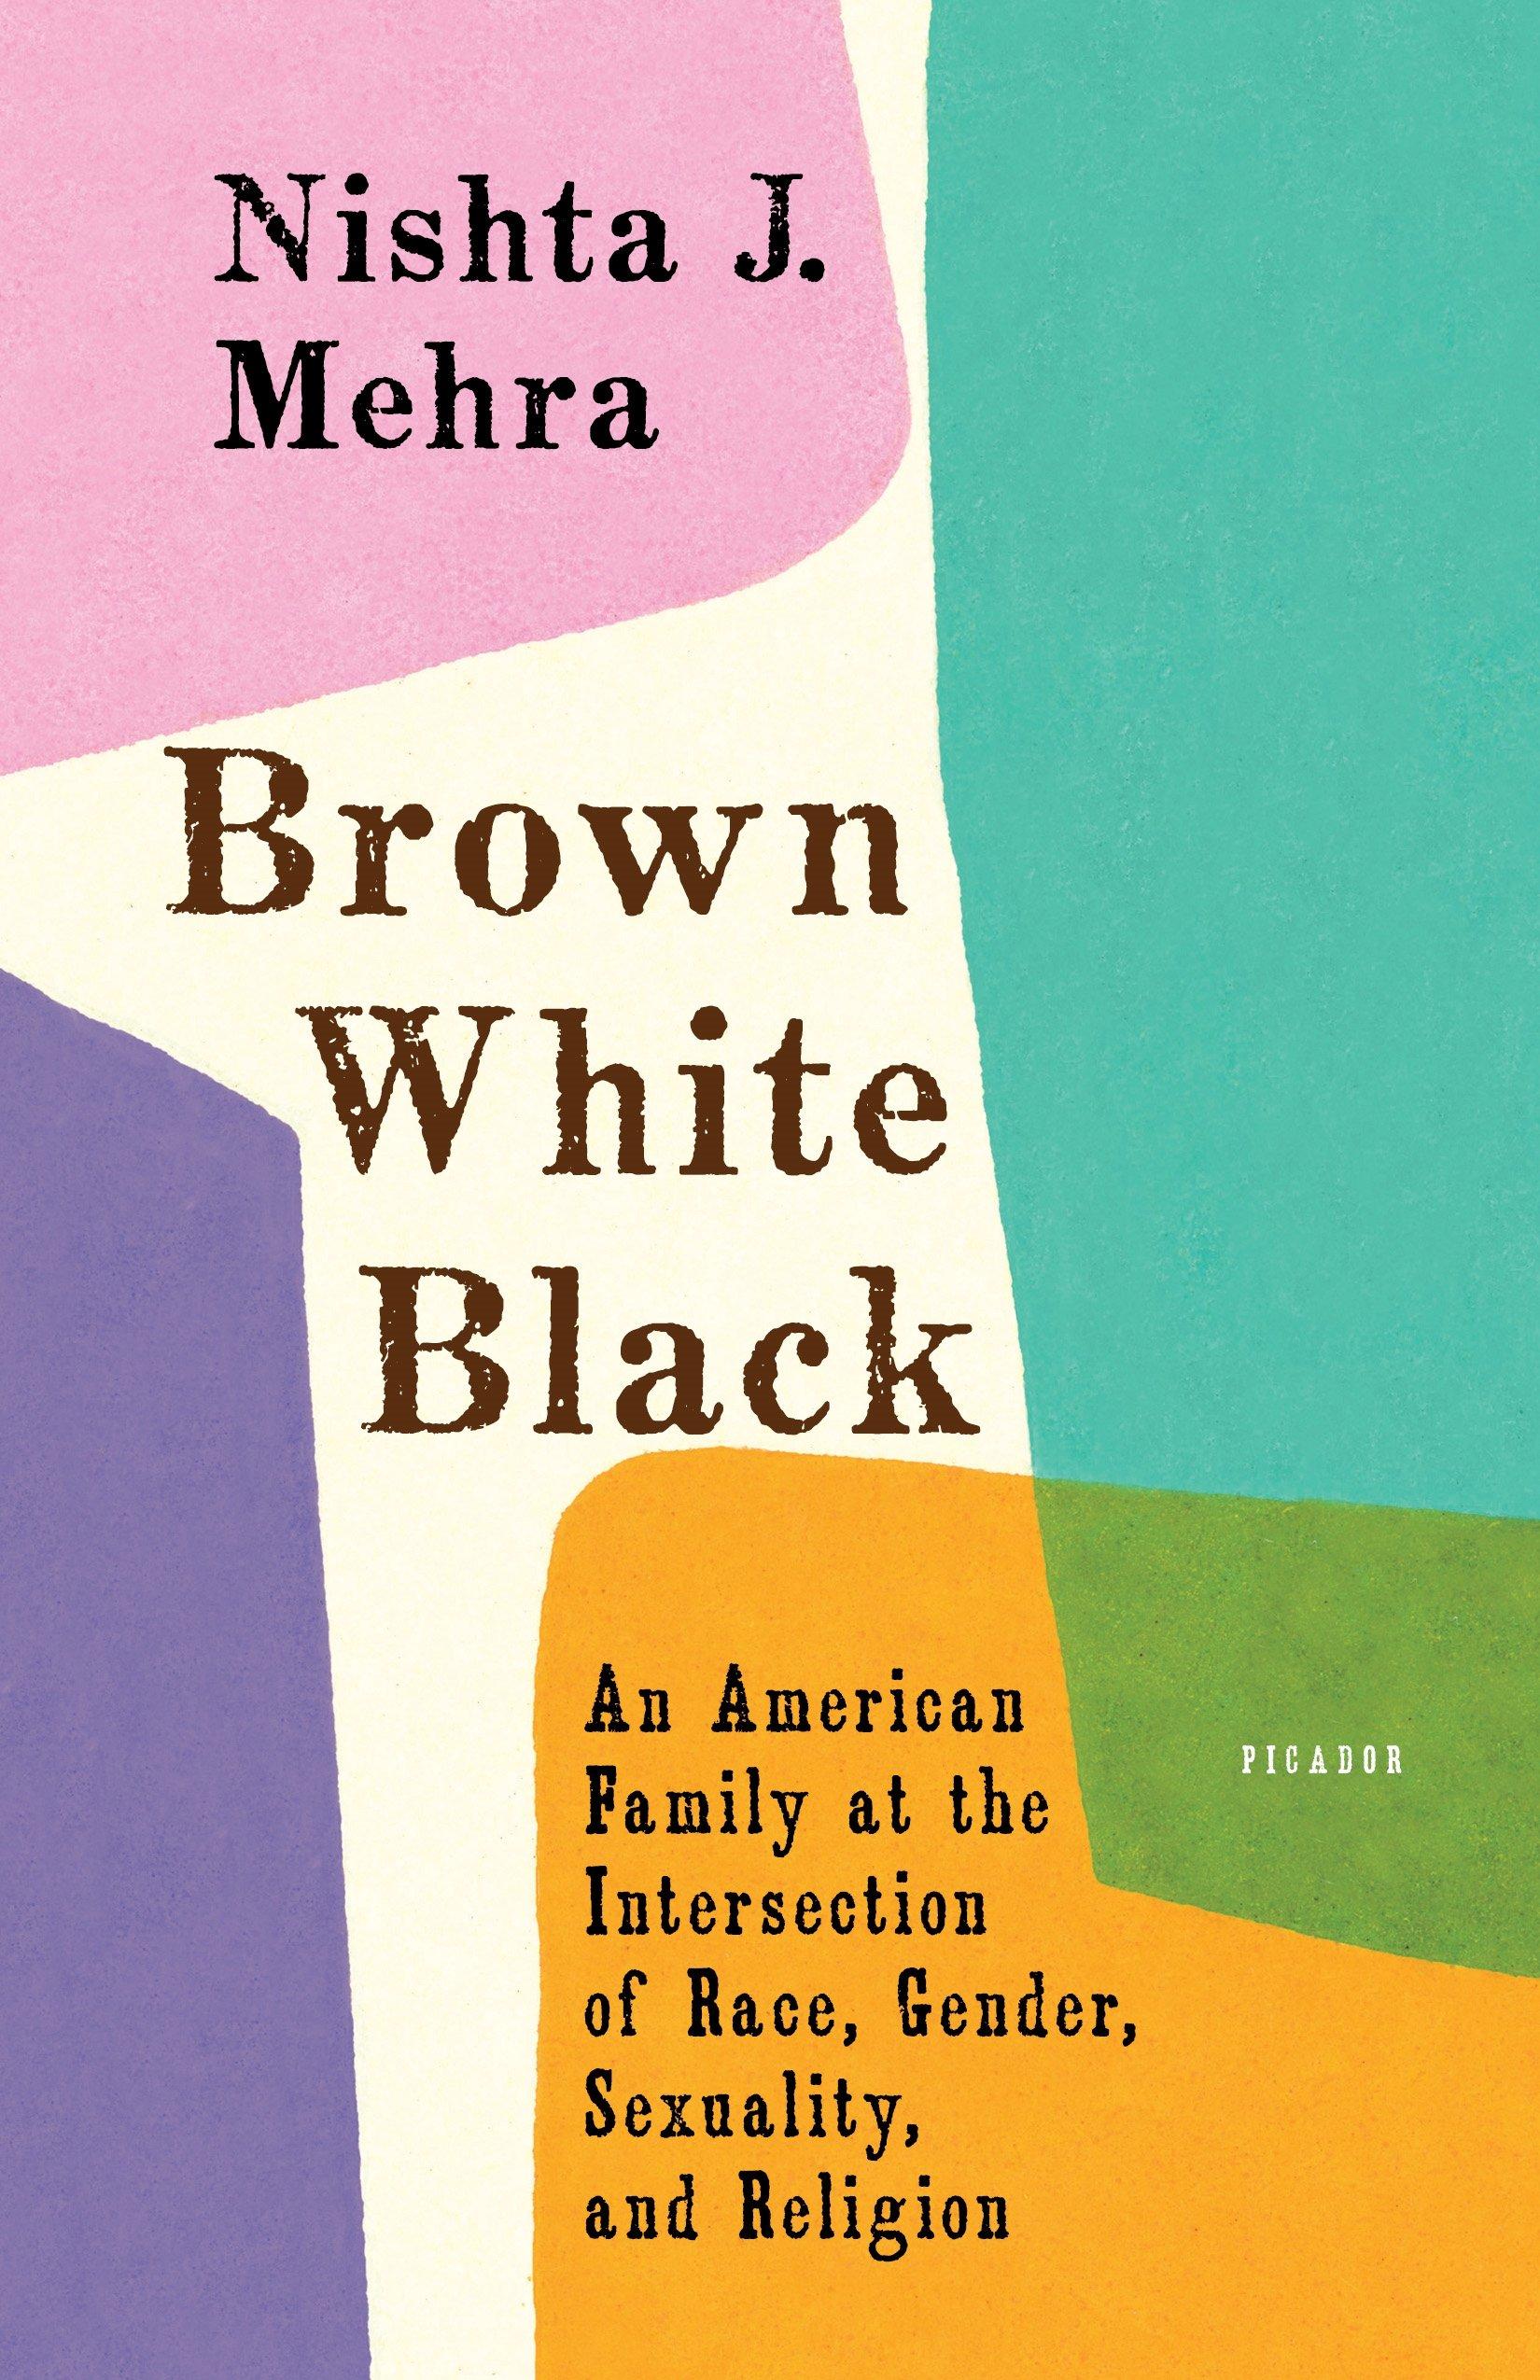 Brown white black by Nishta J. Mehra